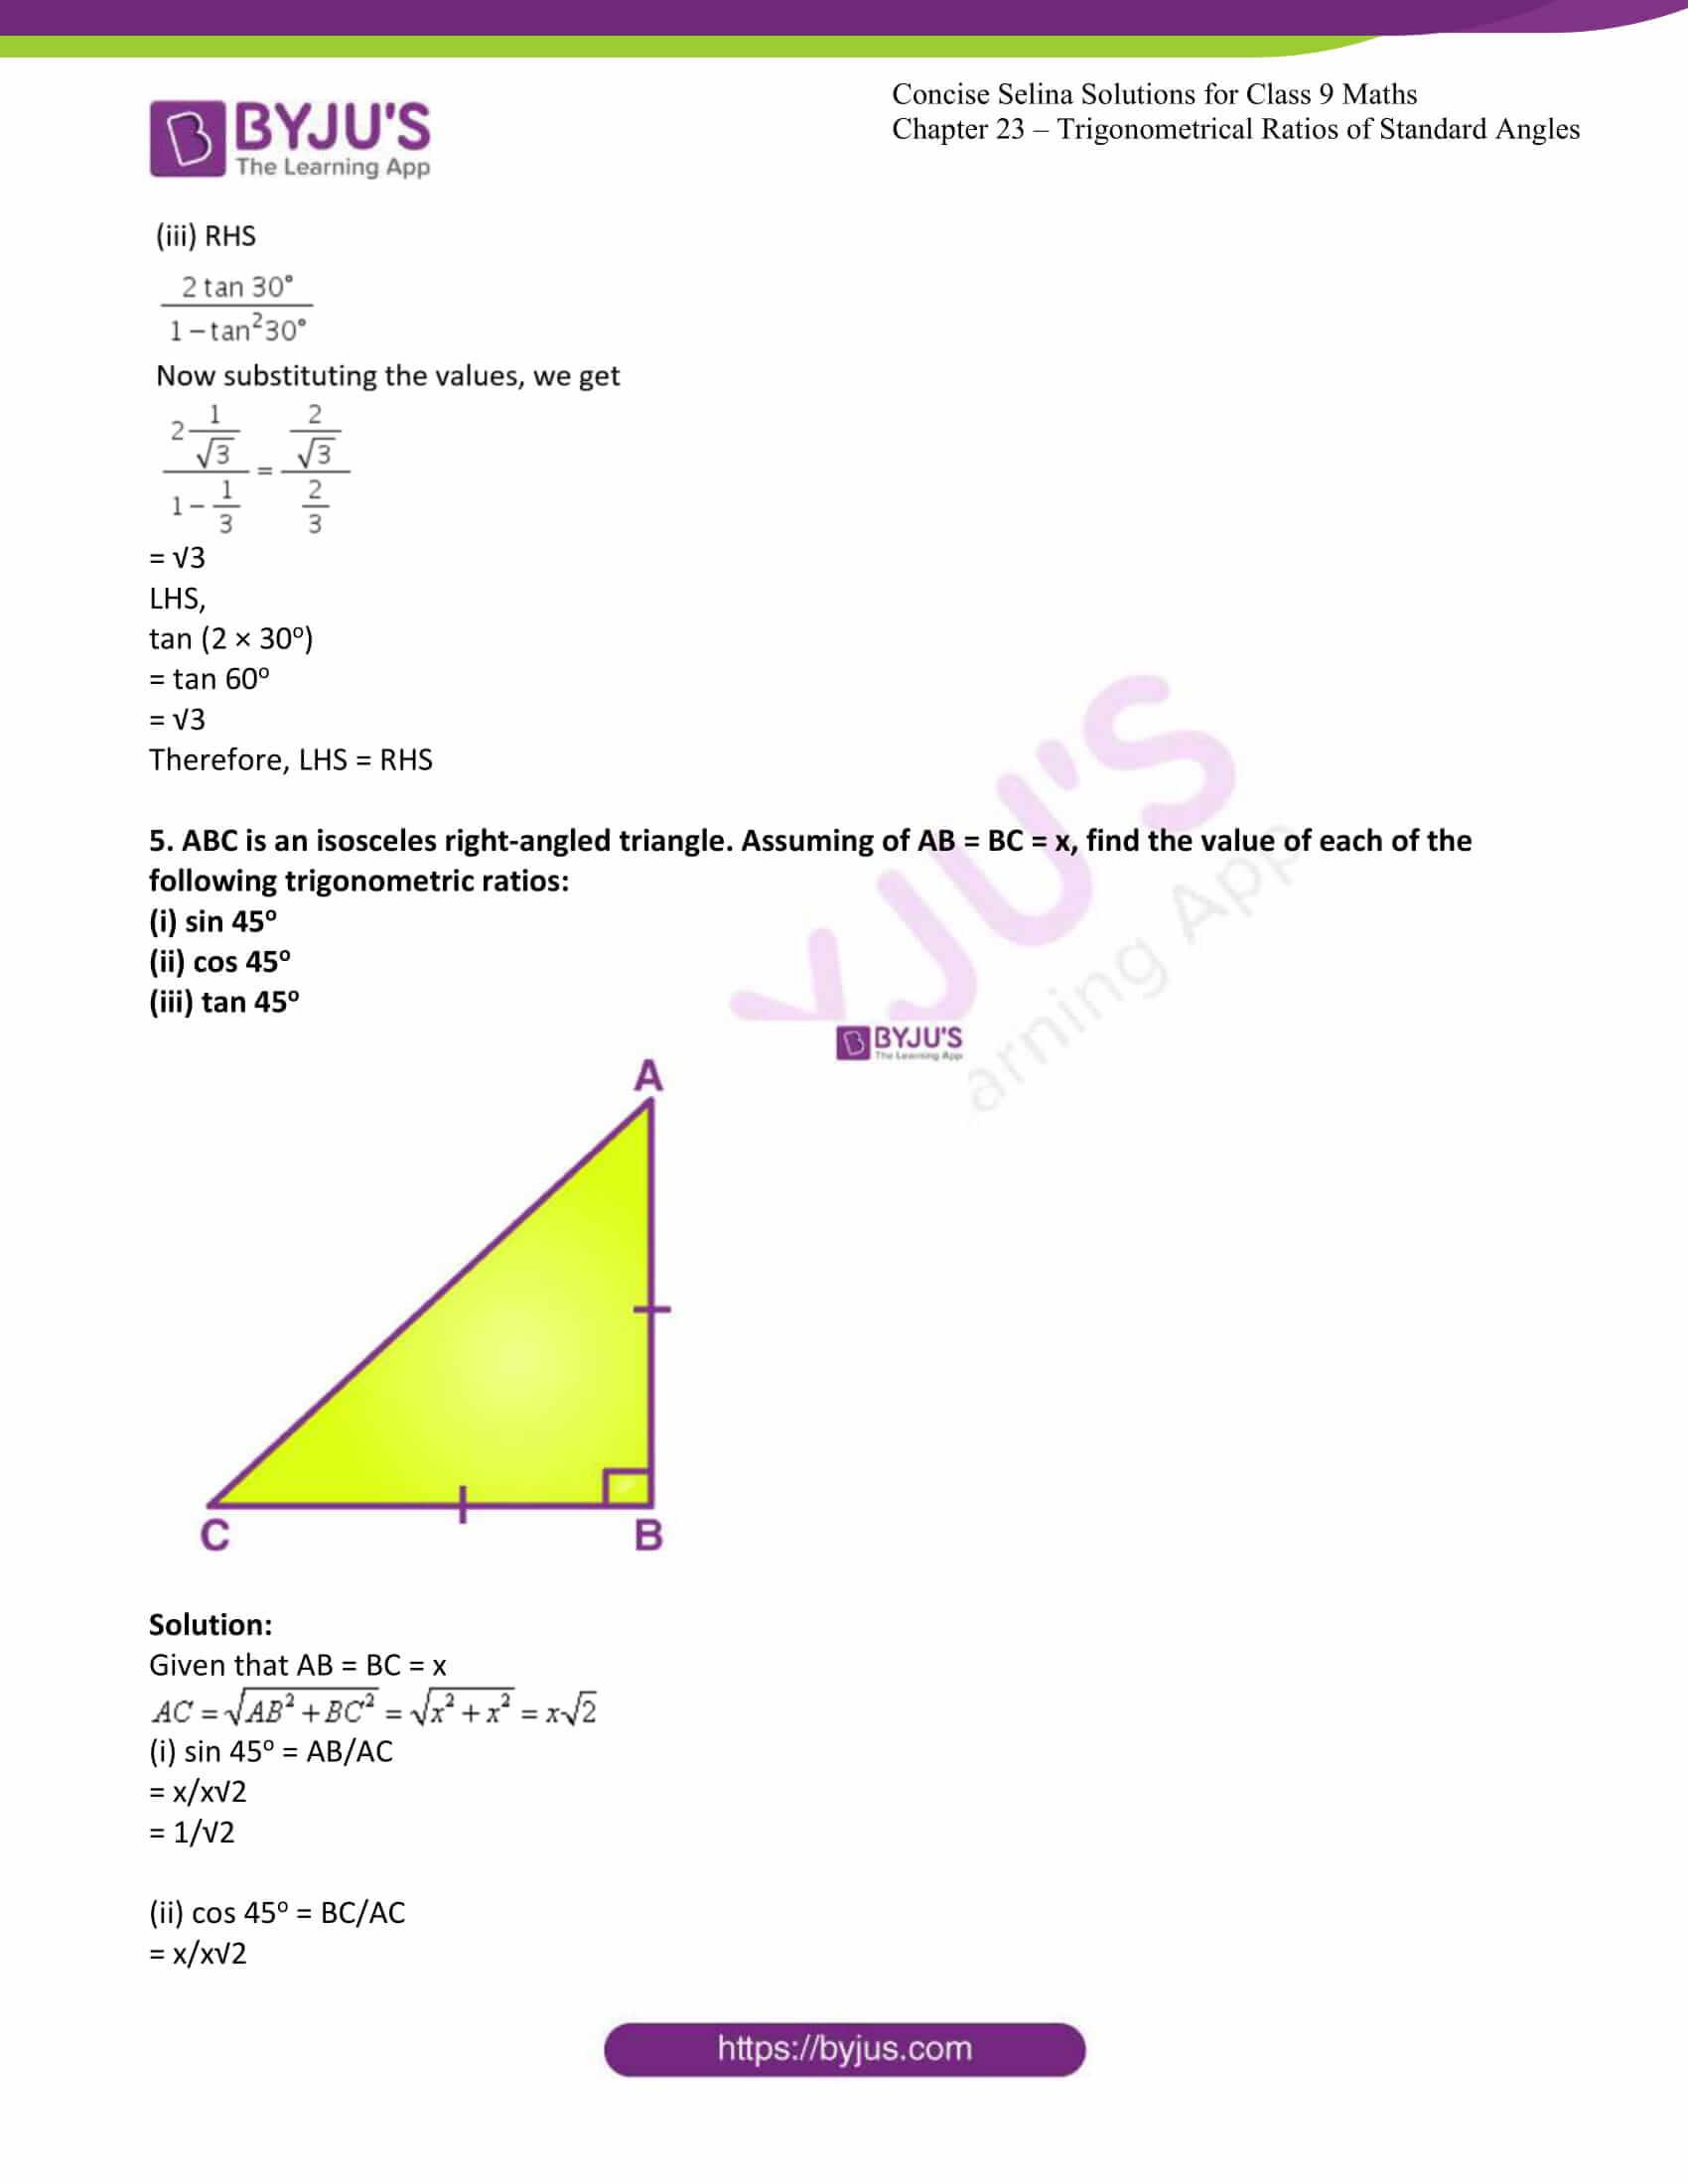 icse class 9 jun7 maths selina solutions chapter 23 trigonometrical ratios of standard angles 05